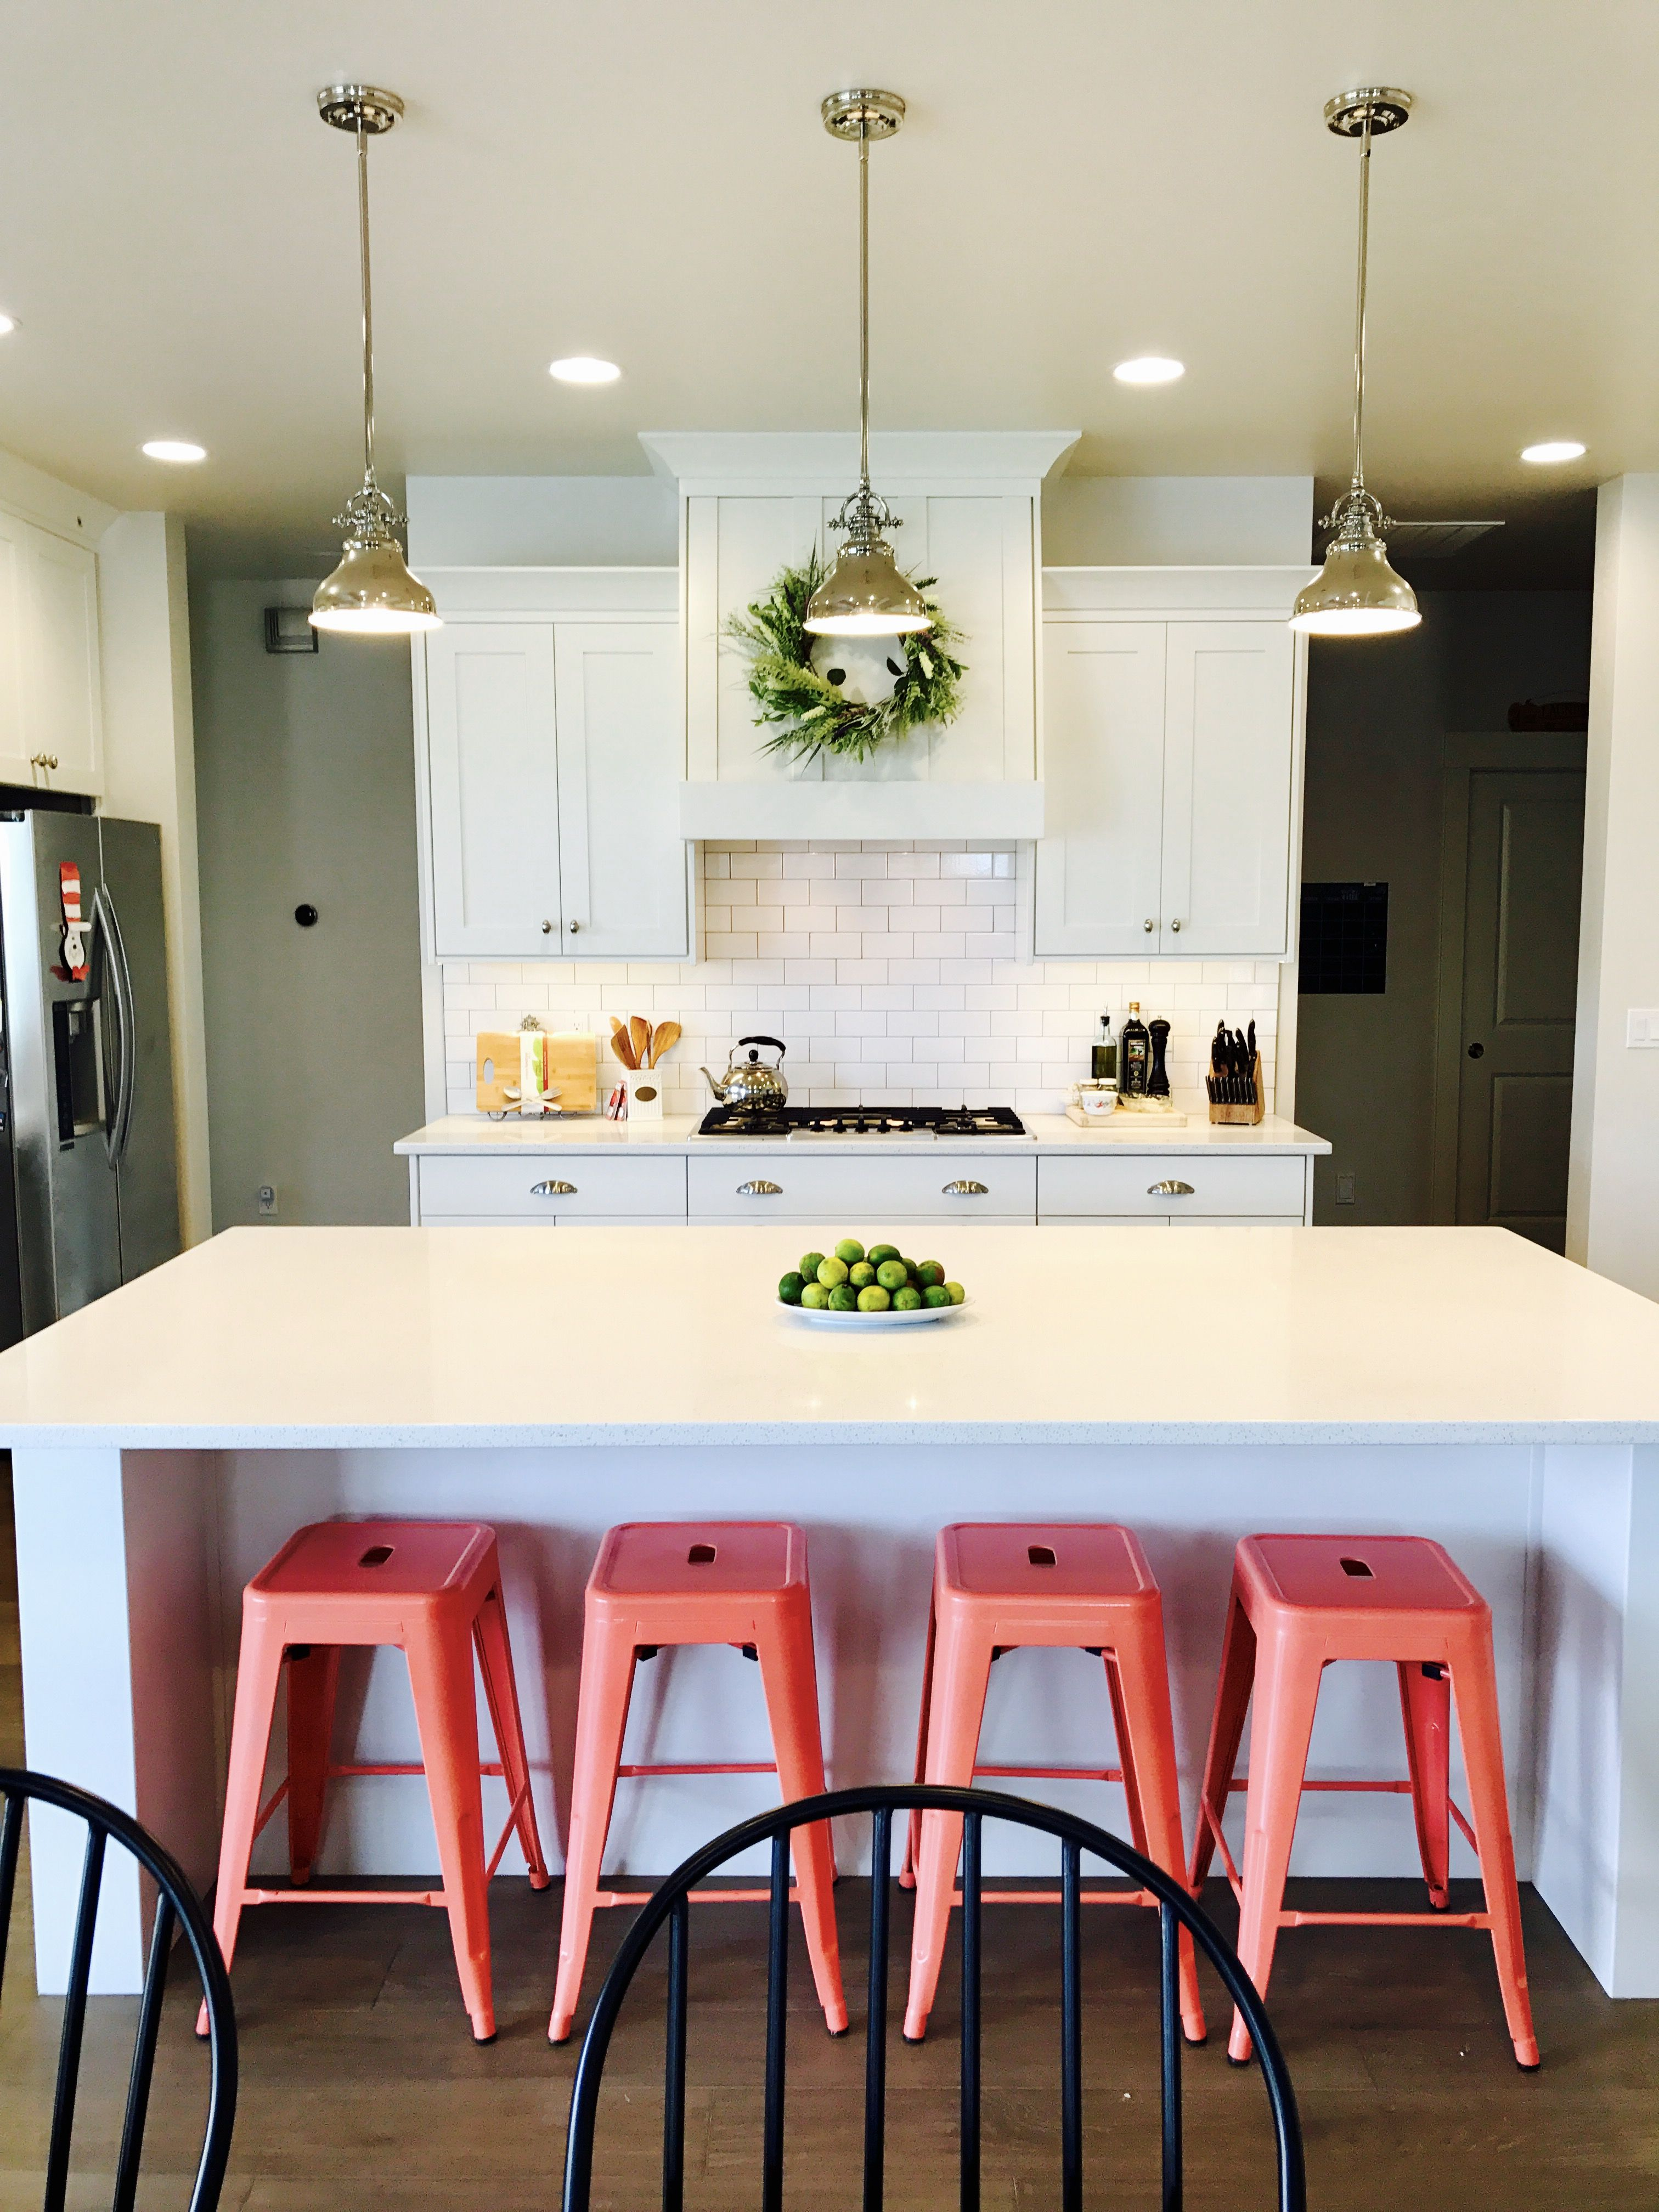 Farmhouse White Kitchen Coral Barstools Coral Kitchen Kitchen Decor Solid Wood Kitchen Cabinets